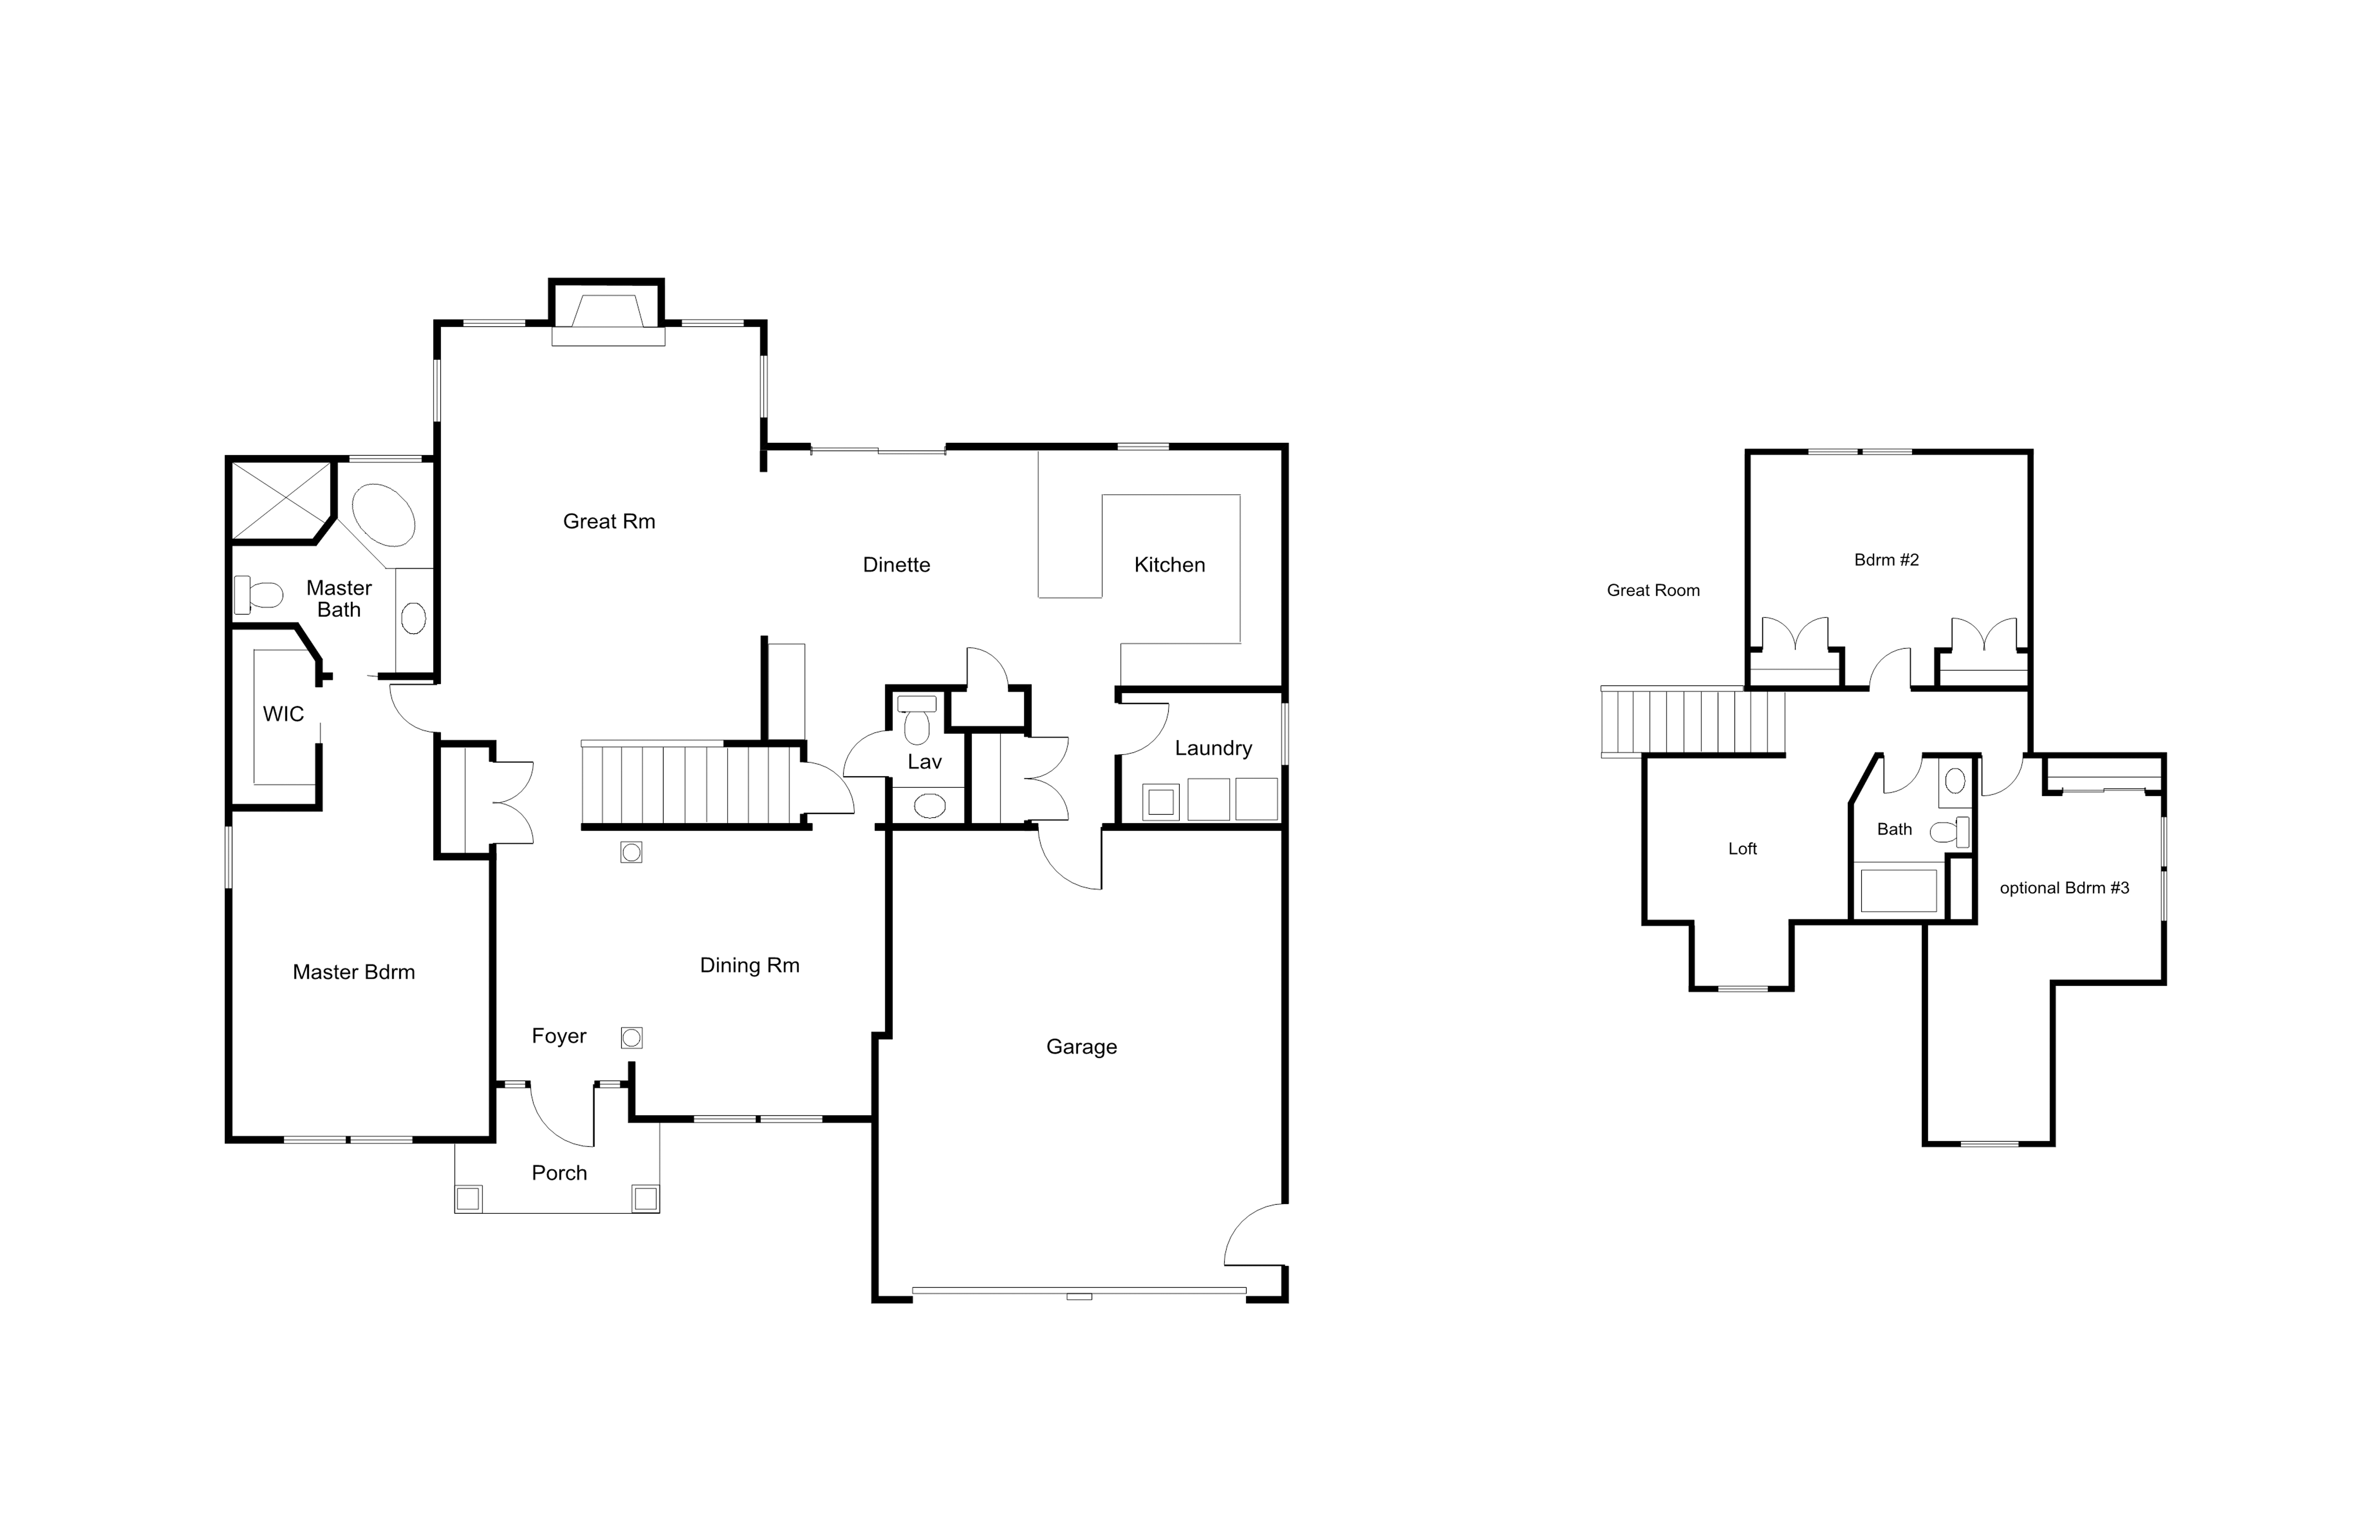 [FP]The Greenbriar Floor Plan